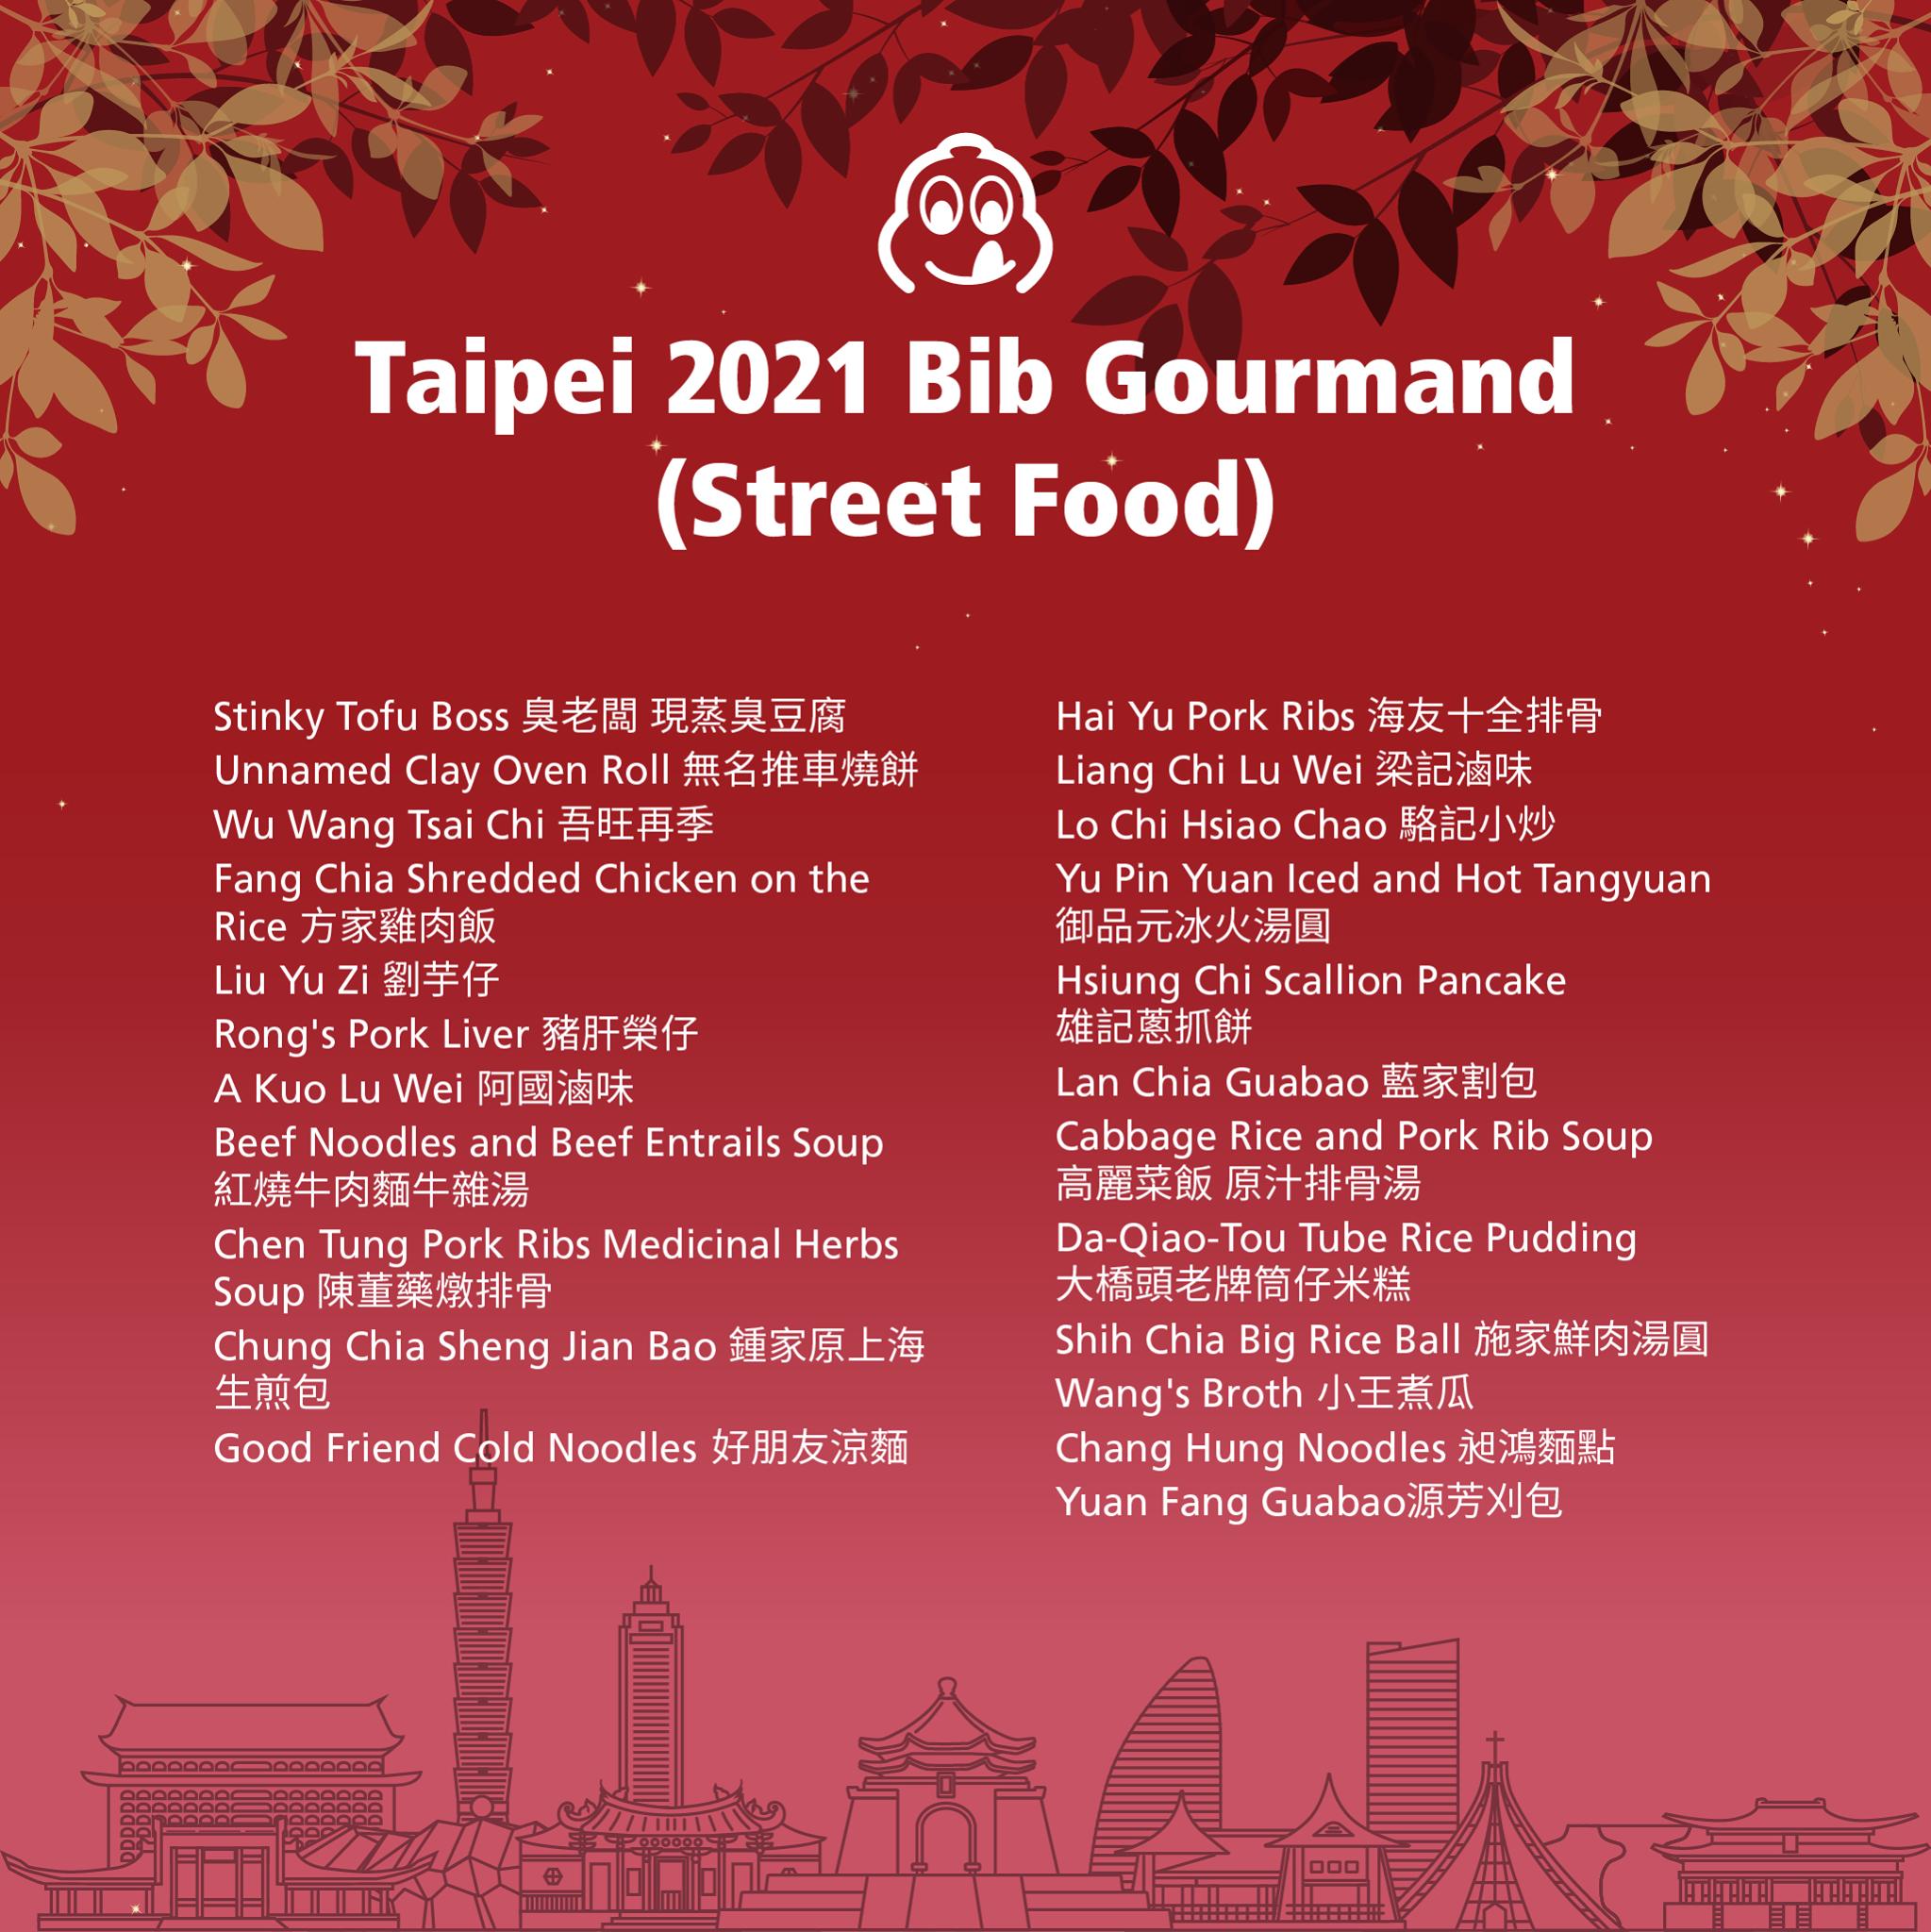 2021台北米其林必比登。超值美食58家|Bib Gourmand Michelin Restaurants in Taipei